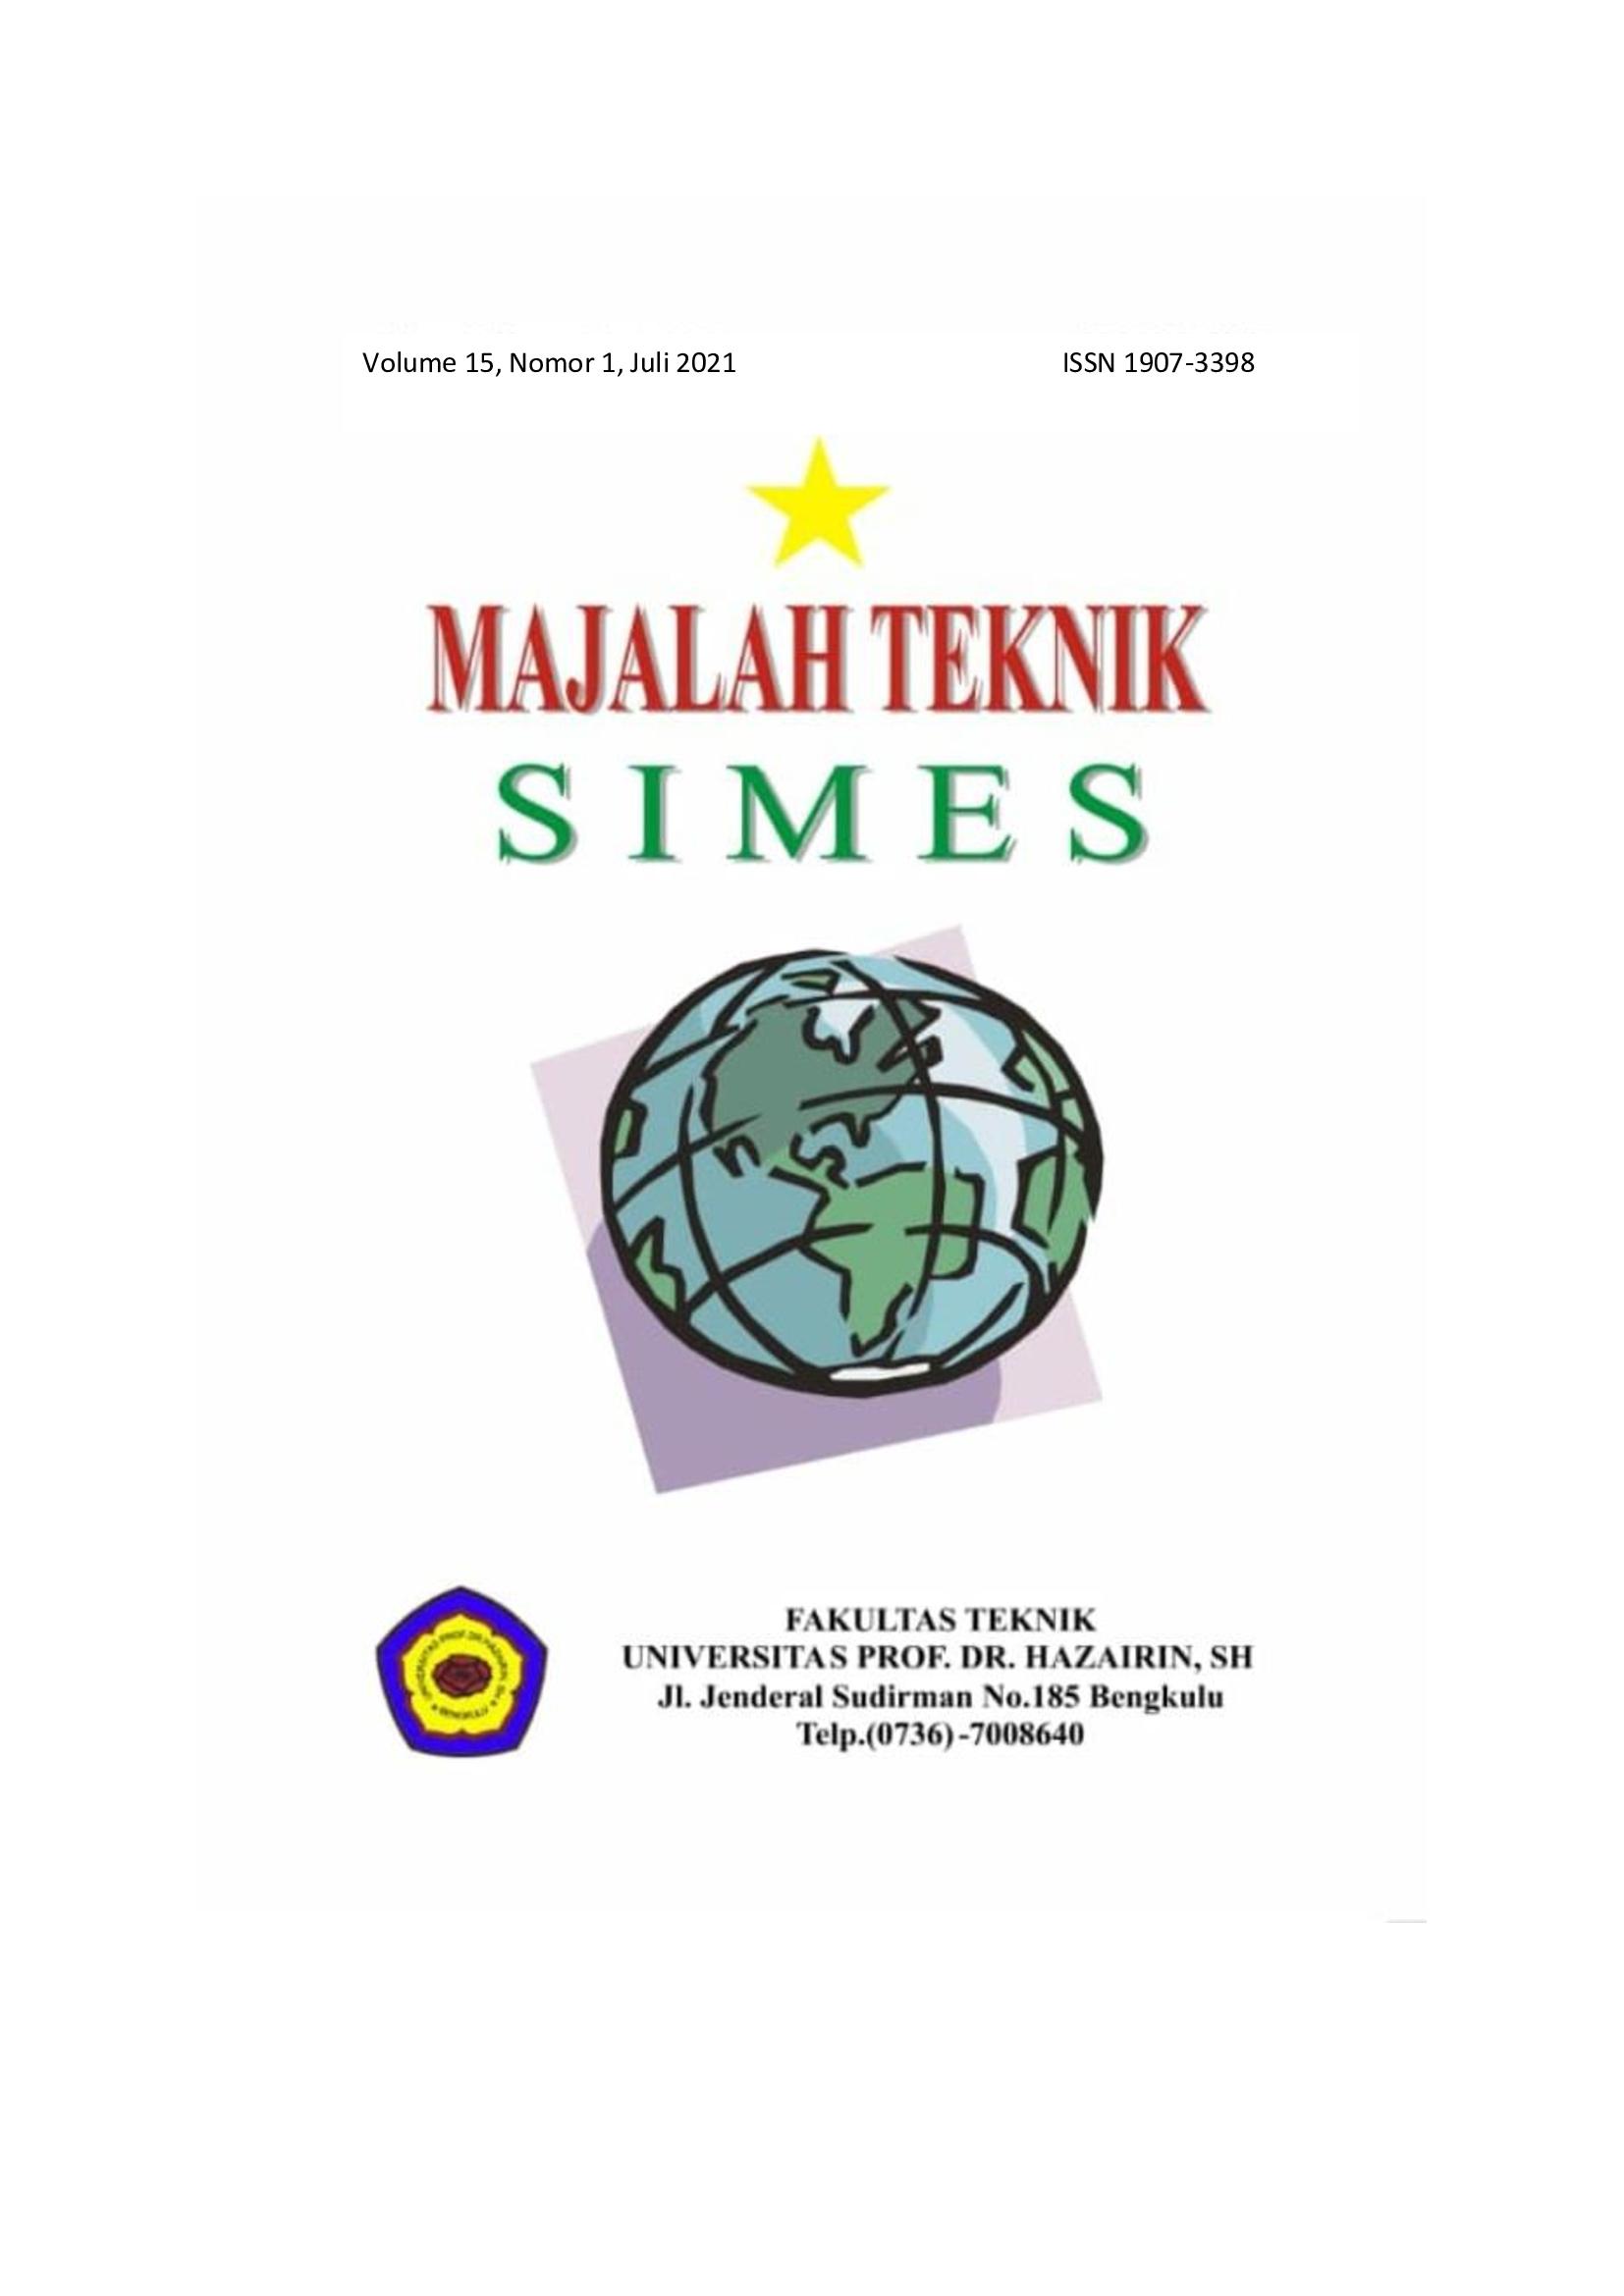 Majalah Simes Volume 15 Nomor 2, Juli 2021